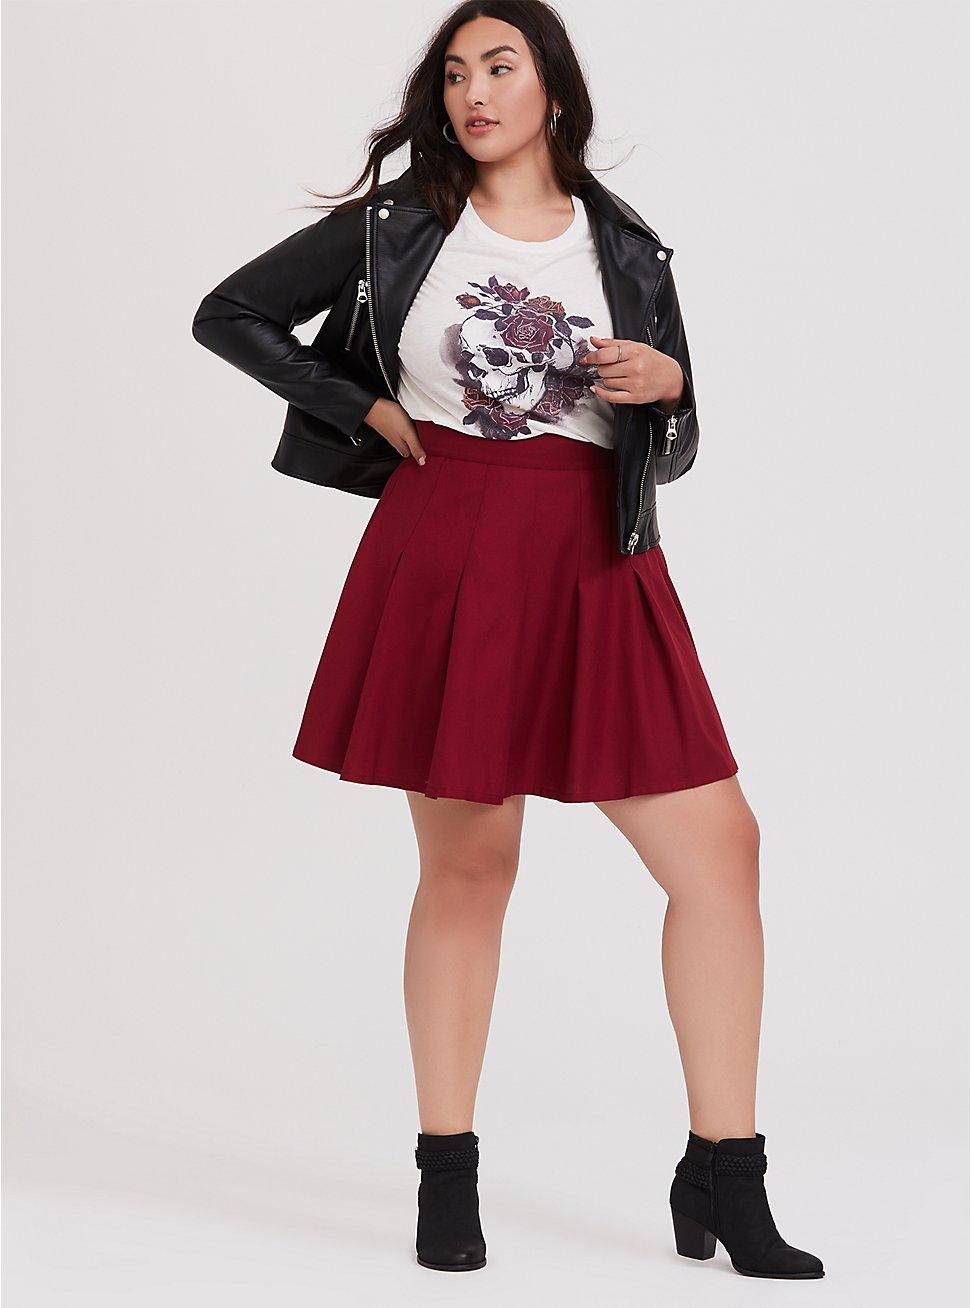 Red Twill Pleated Skater Skirt, BIKING RED, hi-res